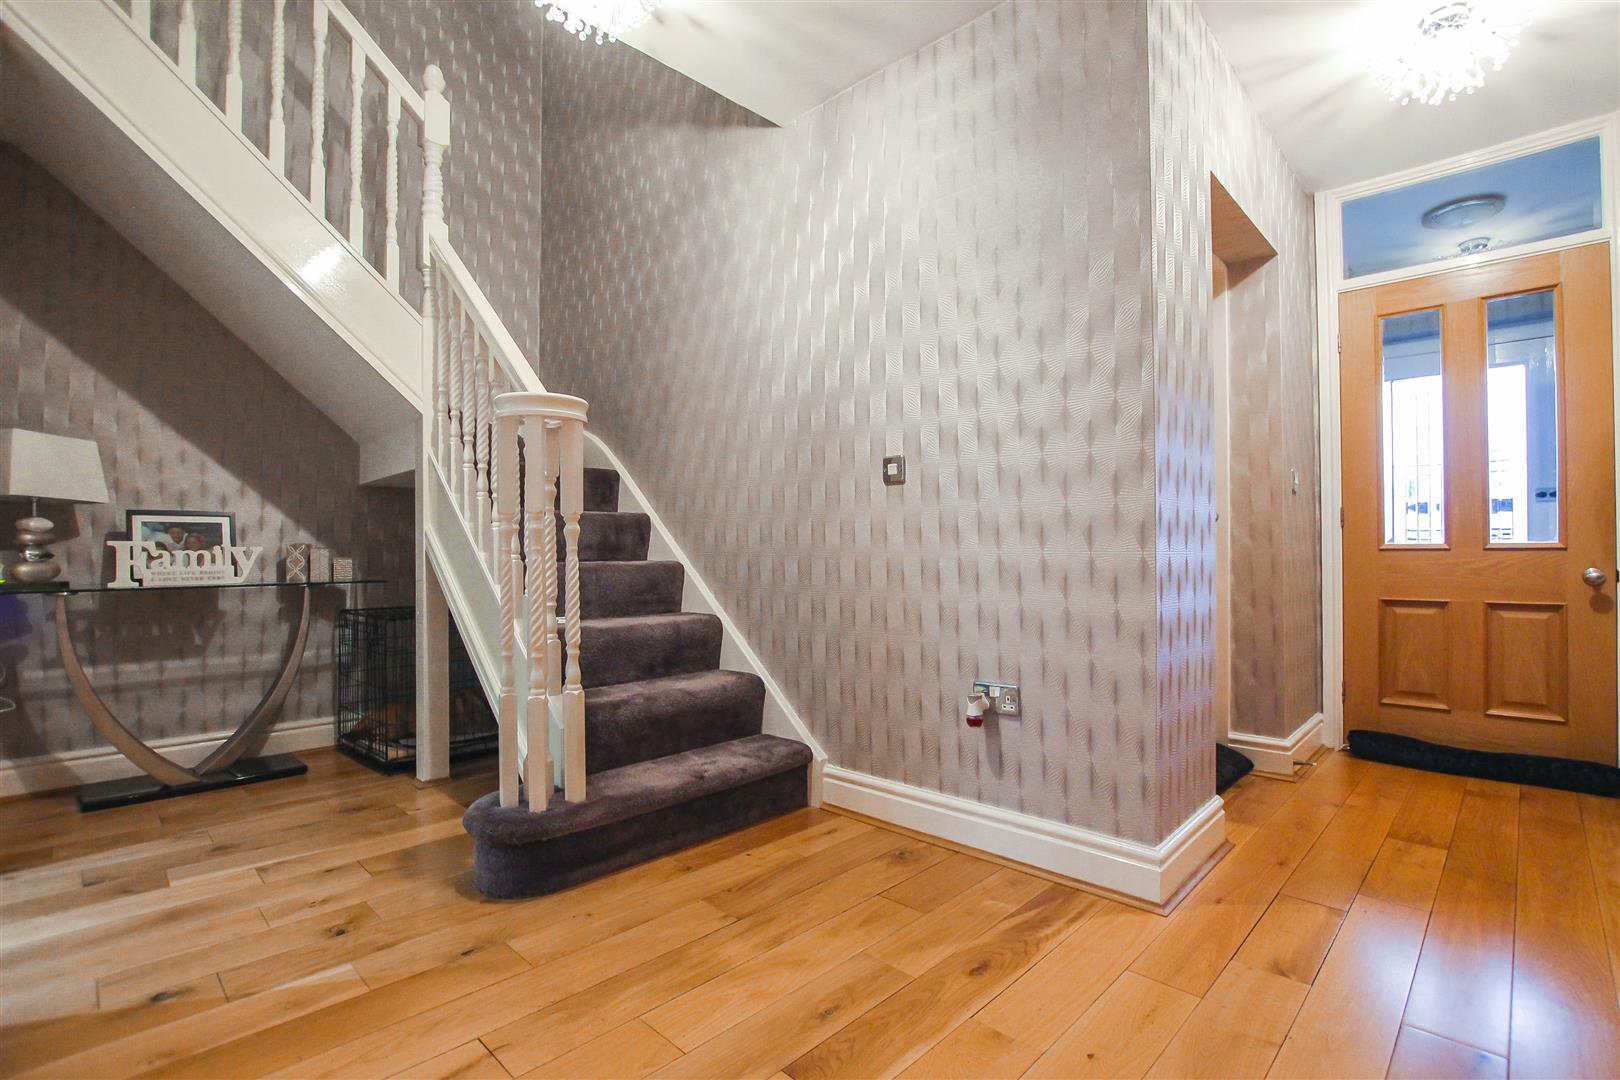 4 Bedroom Detached House For Sale - Hallway